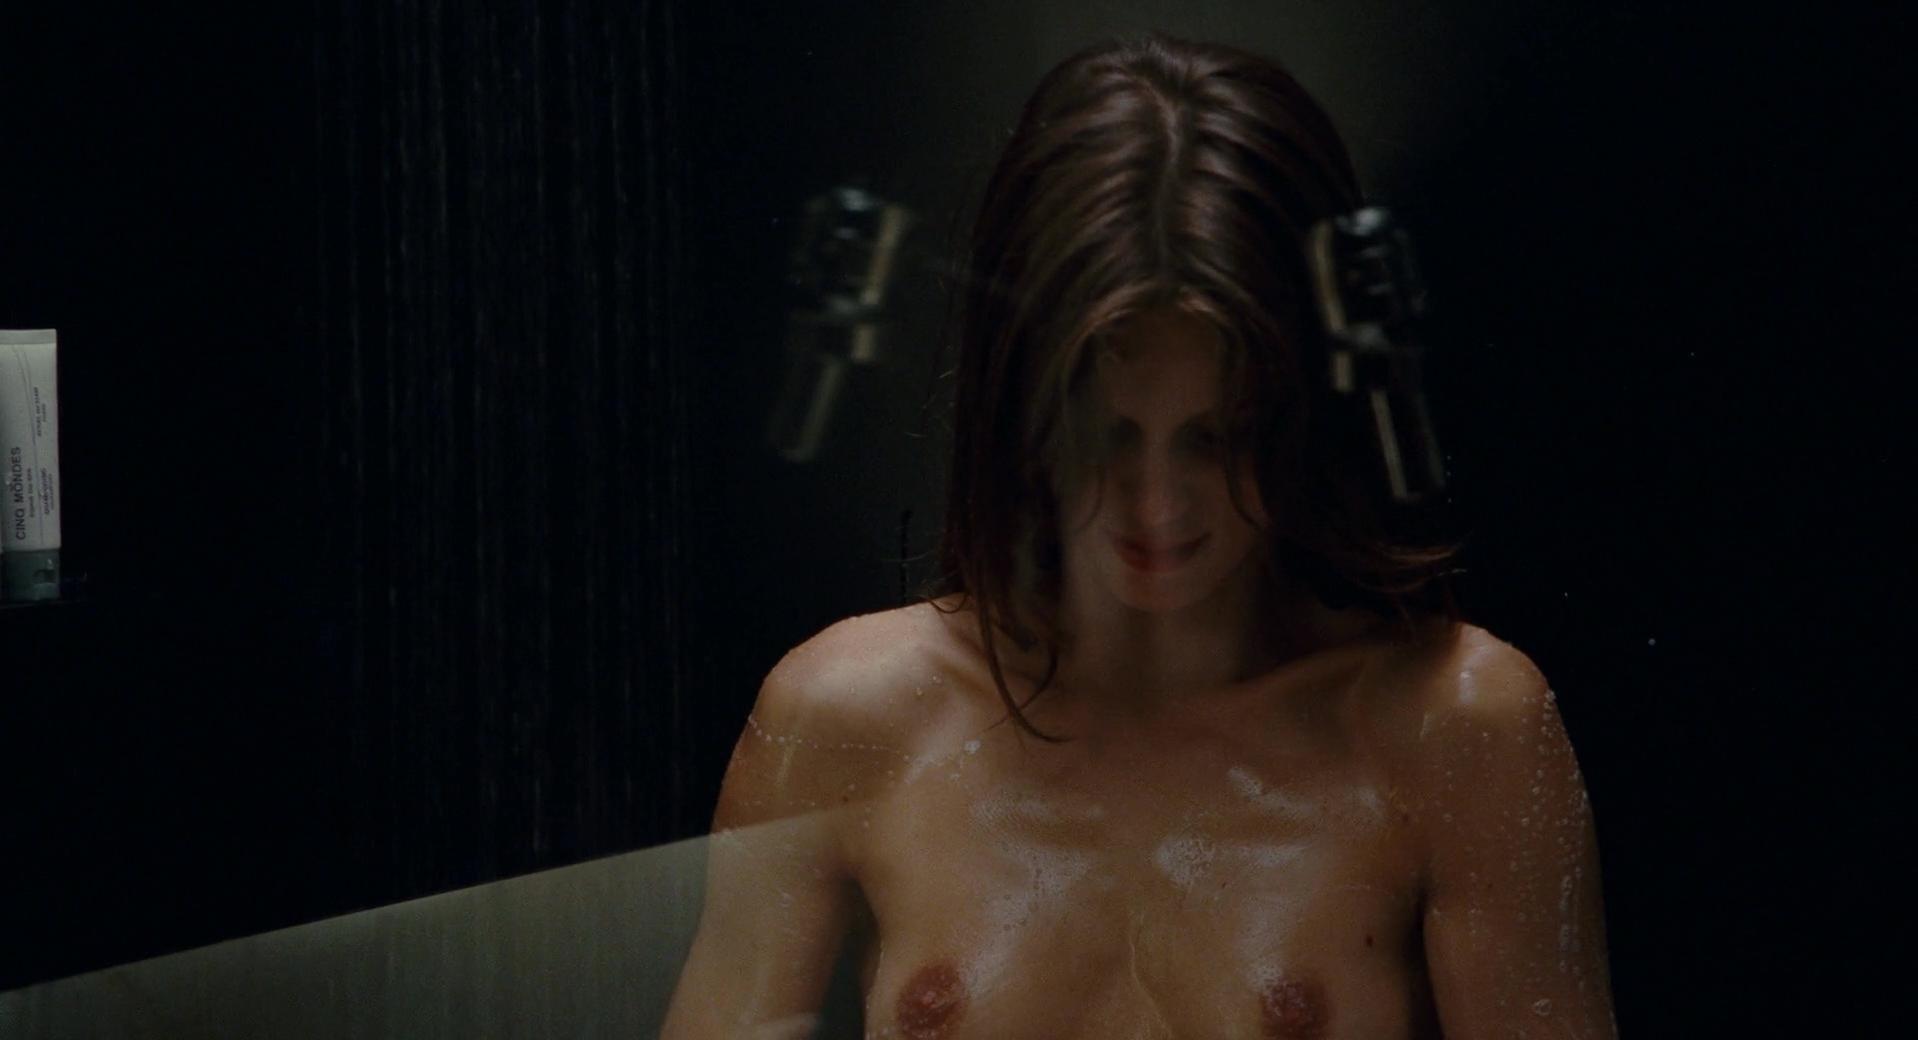 Marine Vacth nude - Jeune & Jolie (2013)